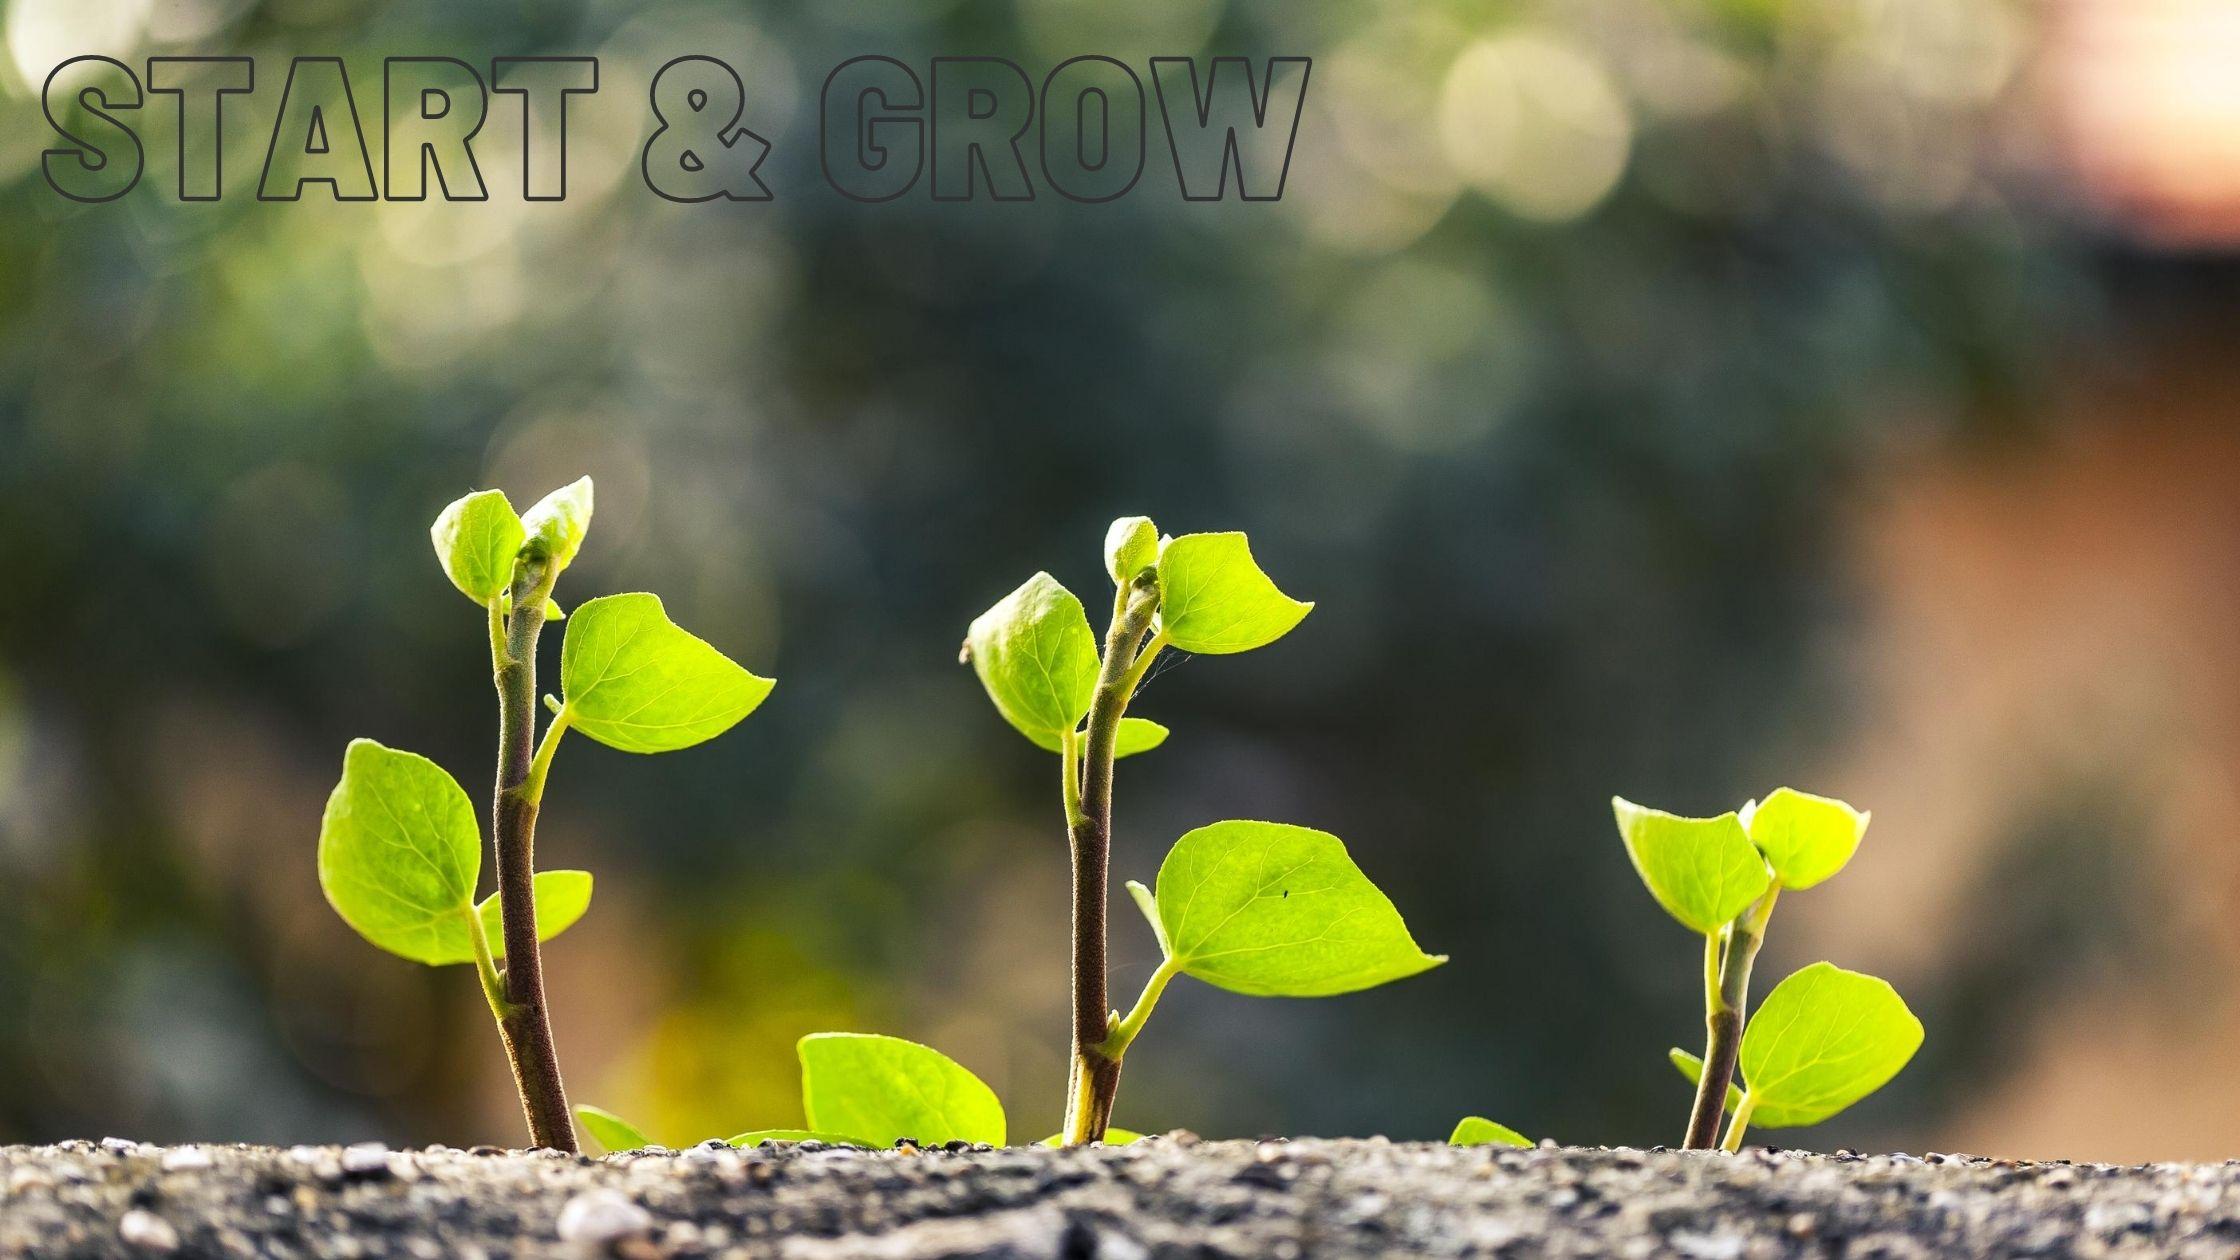 Start your online journey - We help online business start and grow